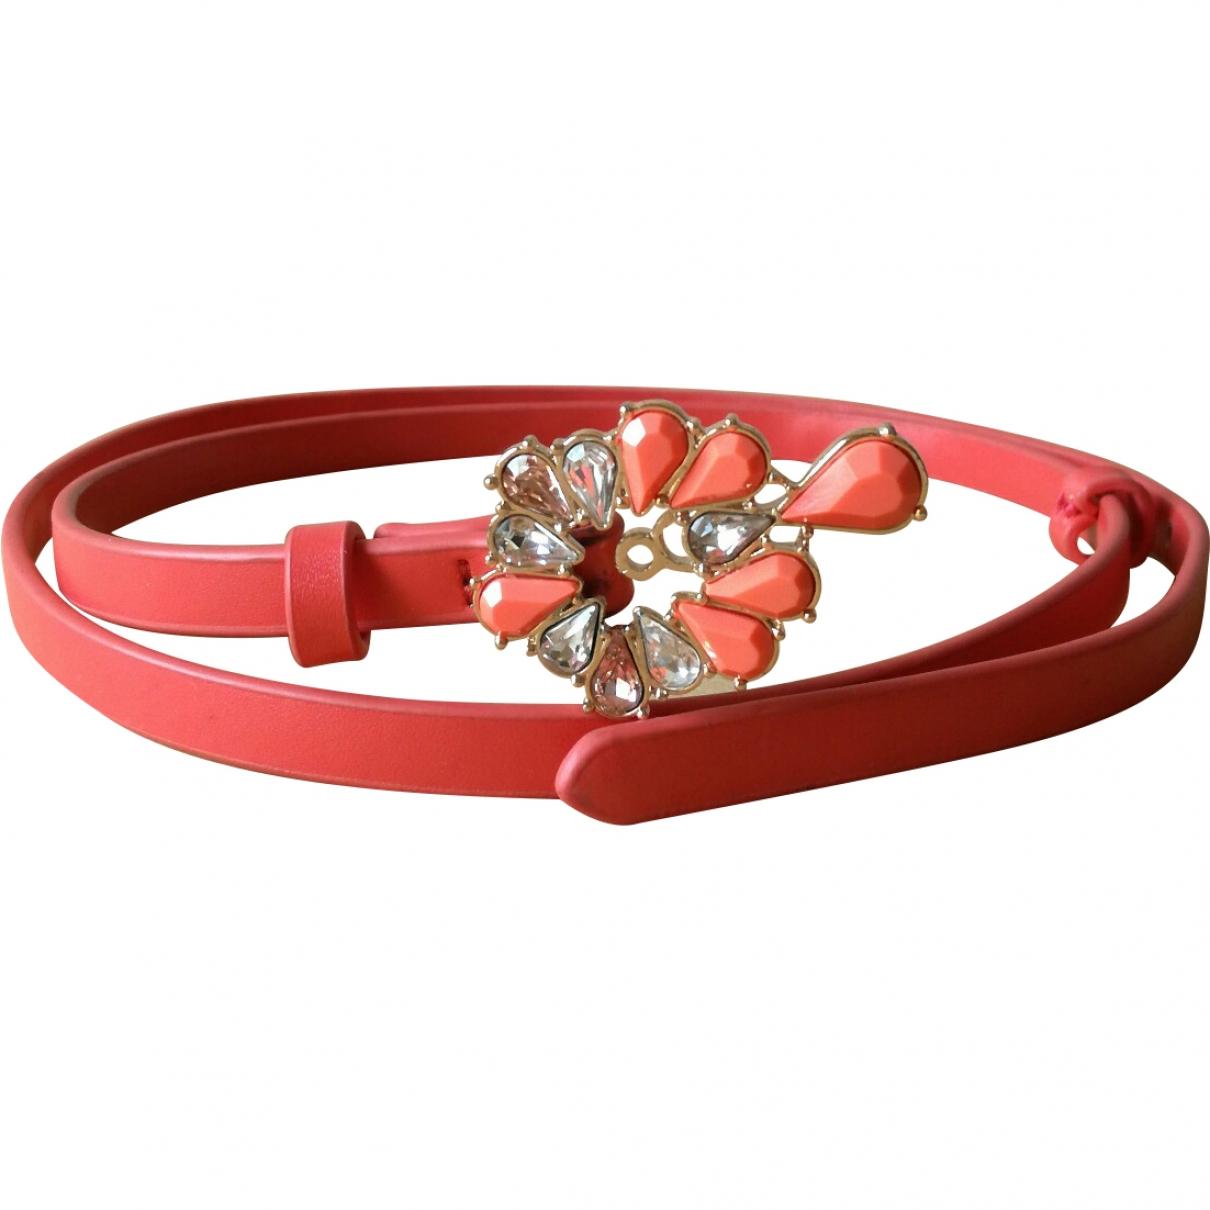 Max & Co \N Orange Leather belt for Women S International